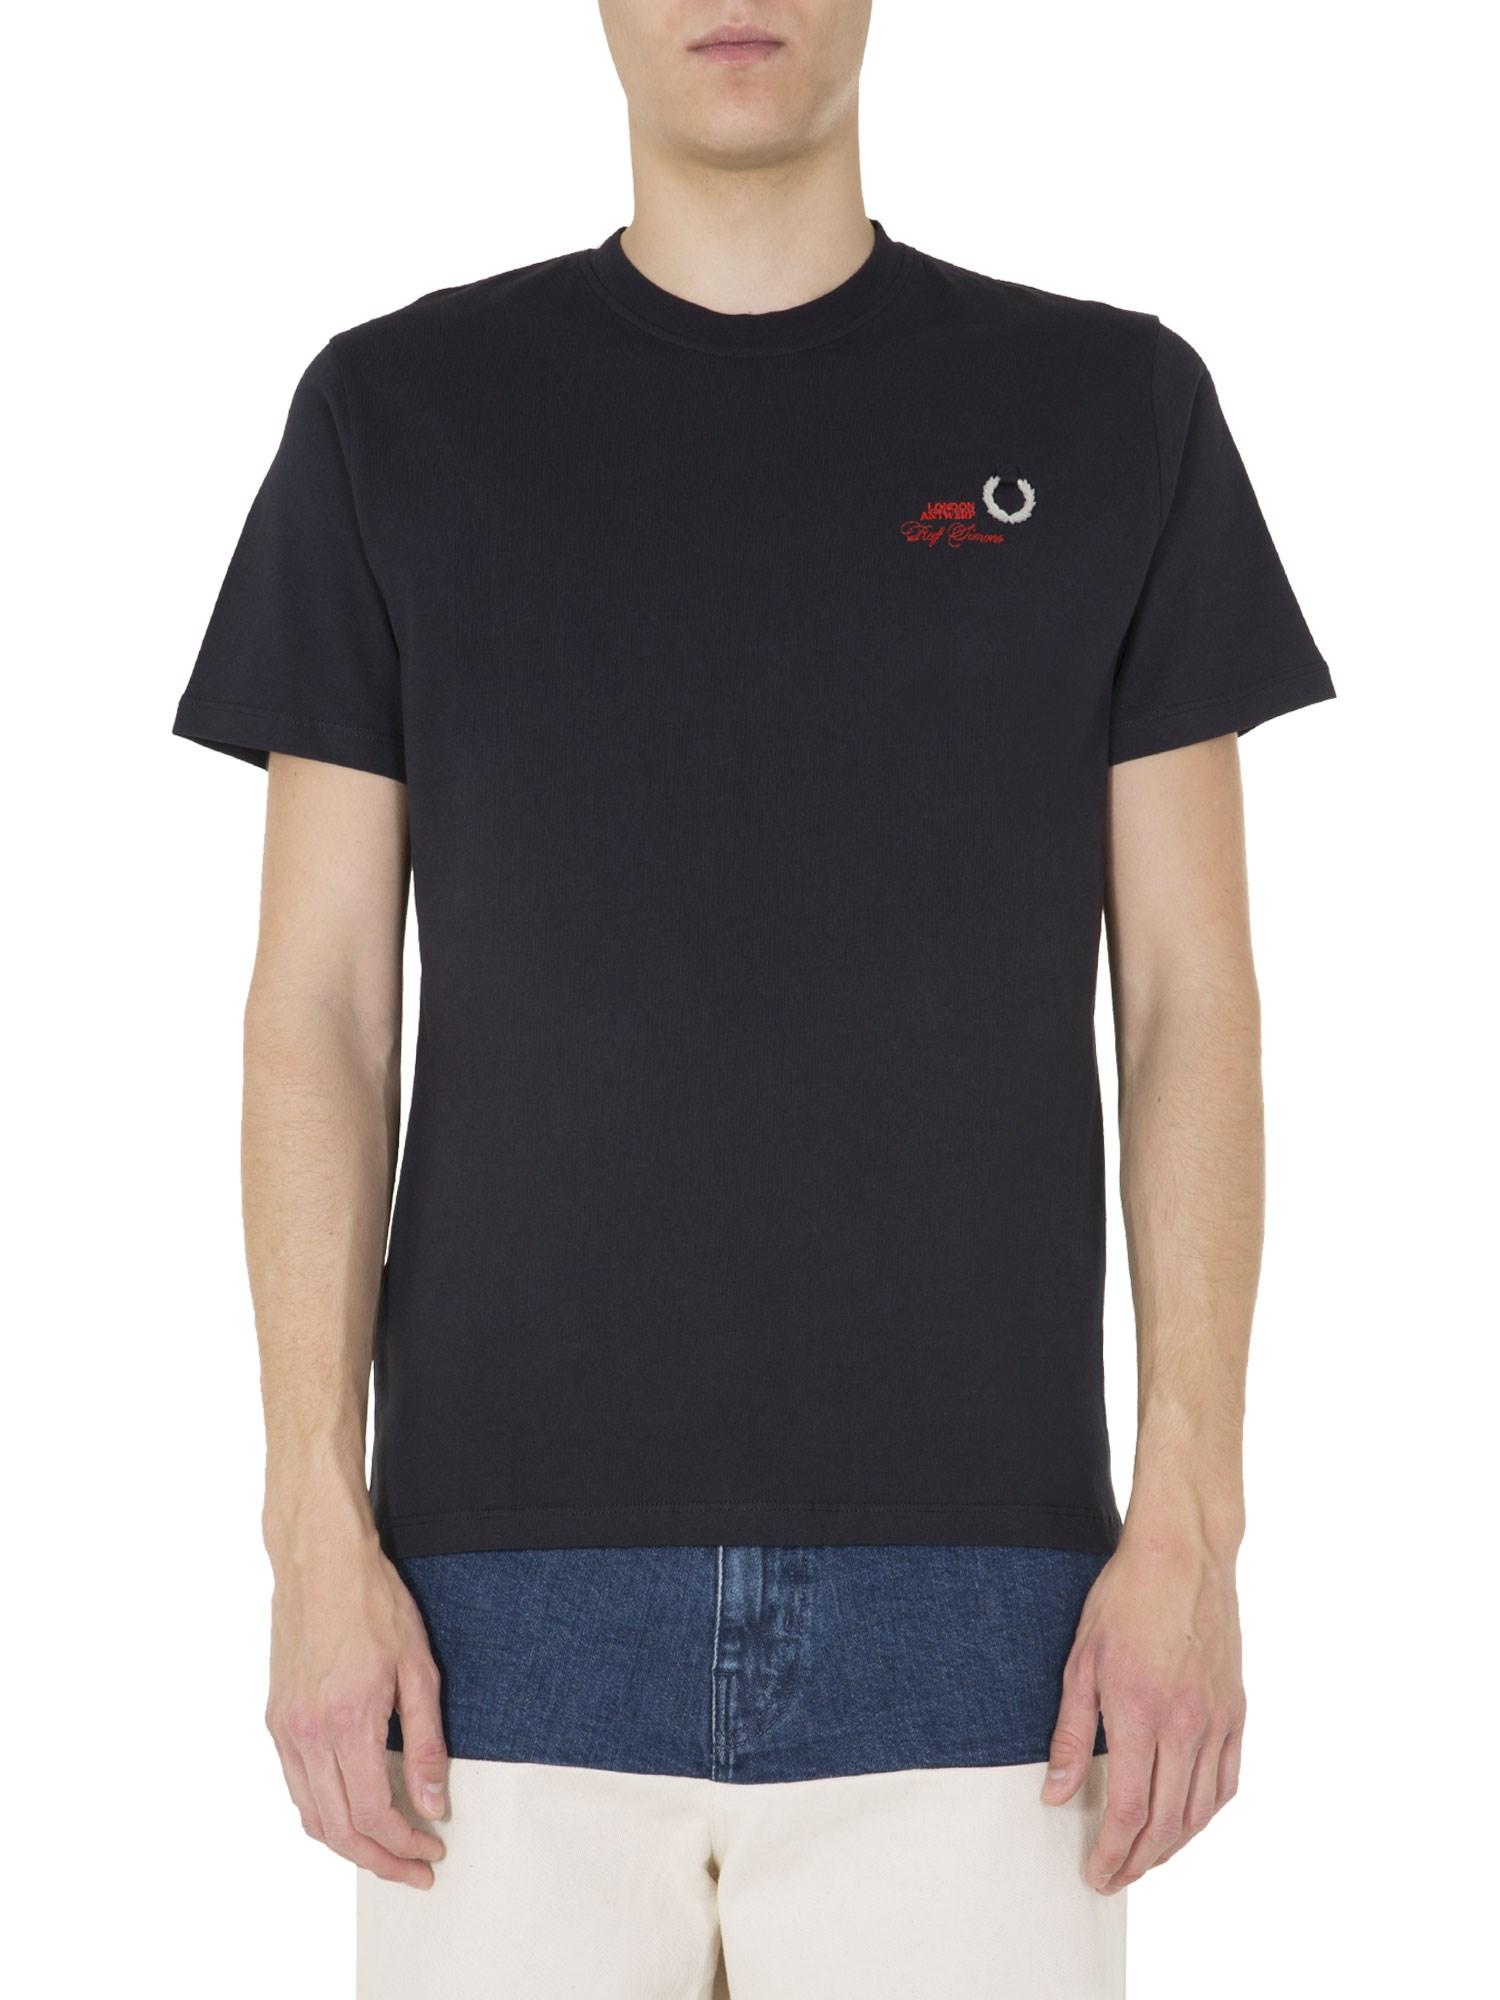 Round neck t-shirt - fred perry x raf simons - Modalova